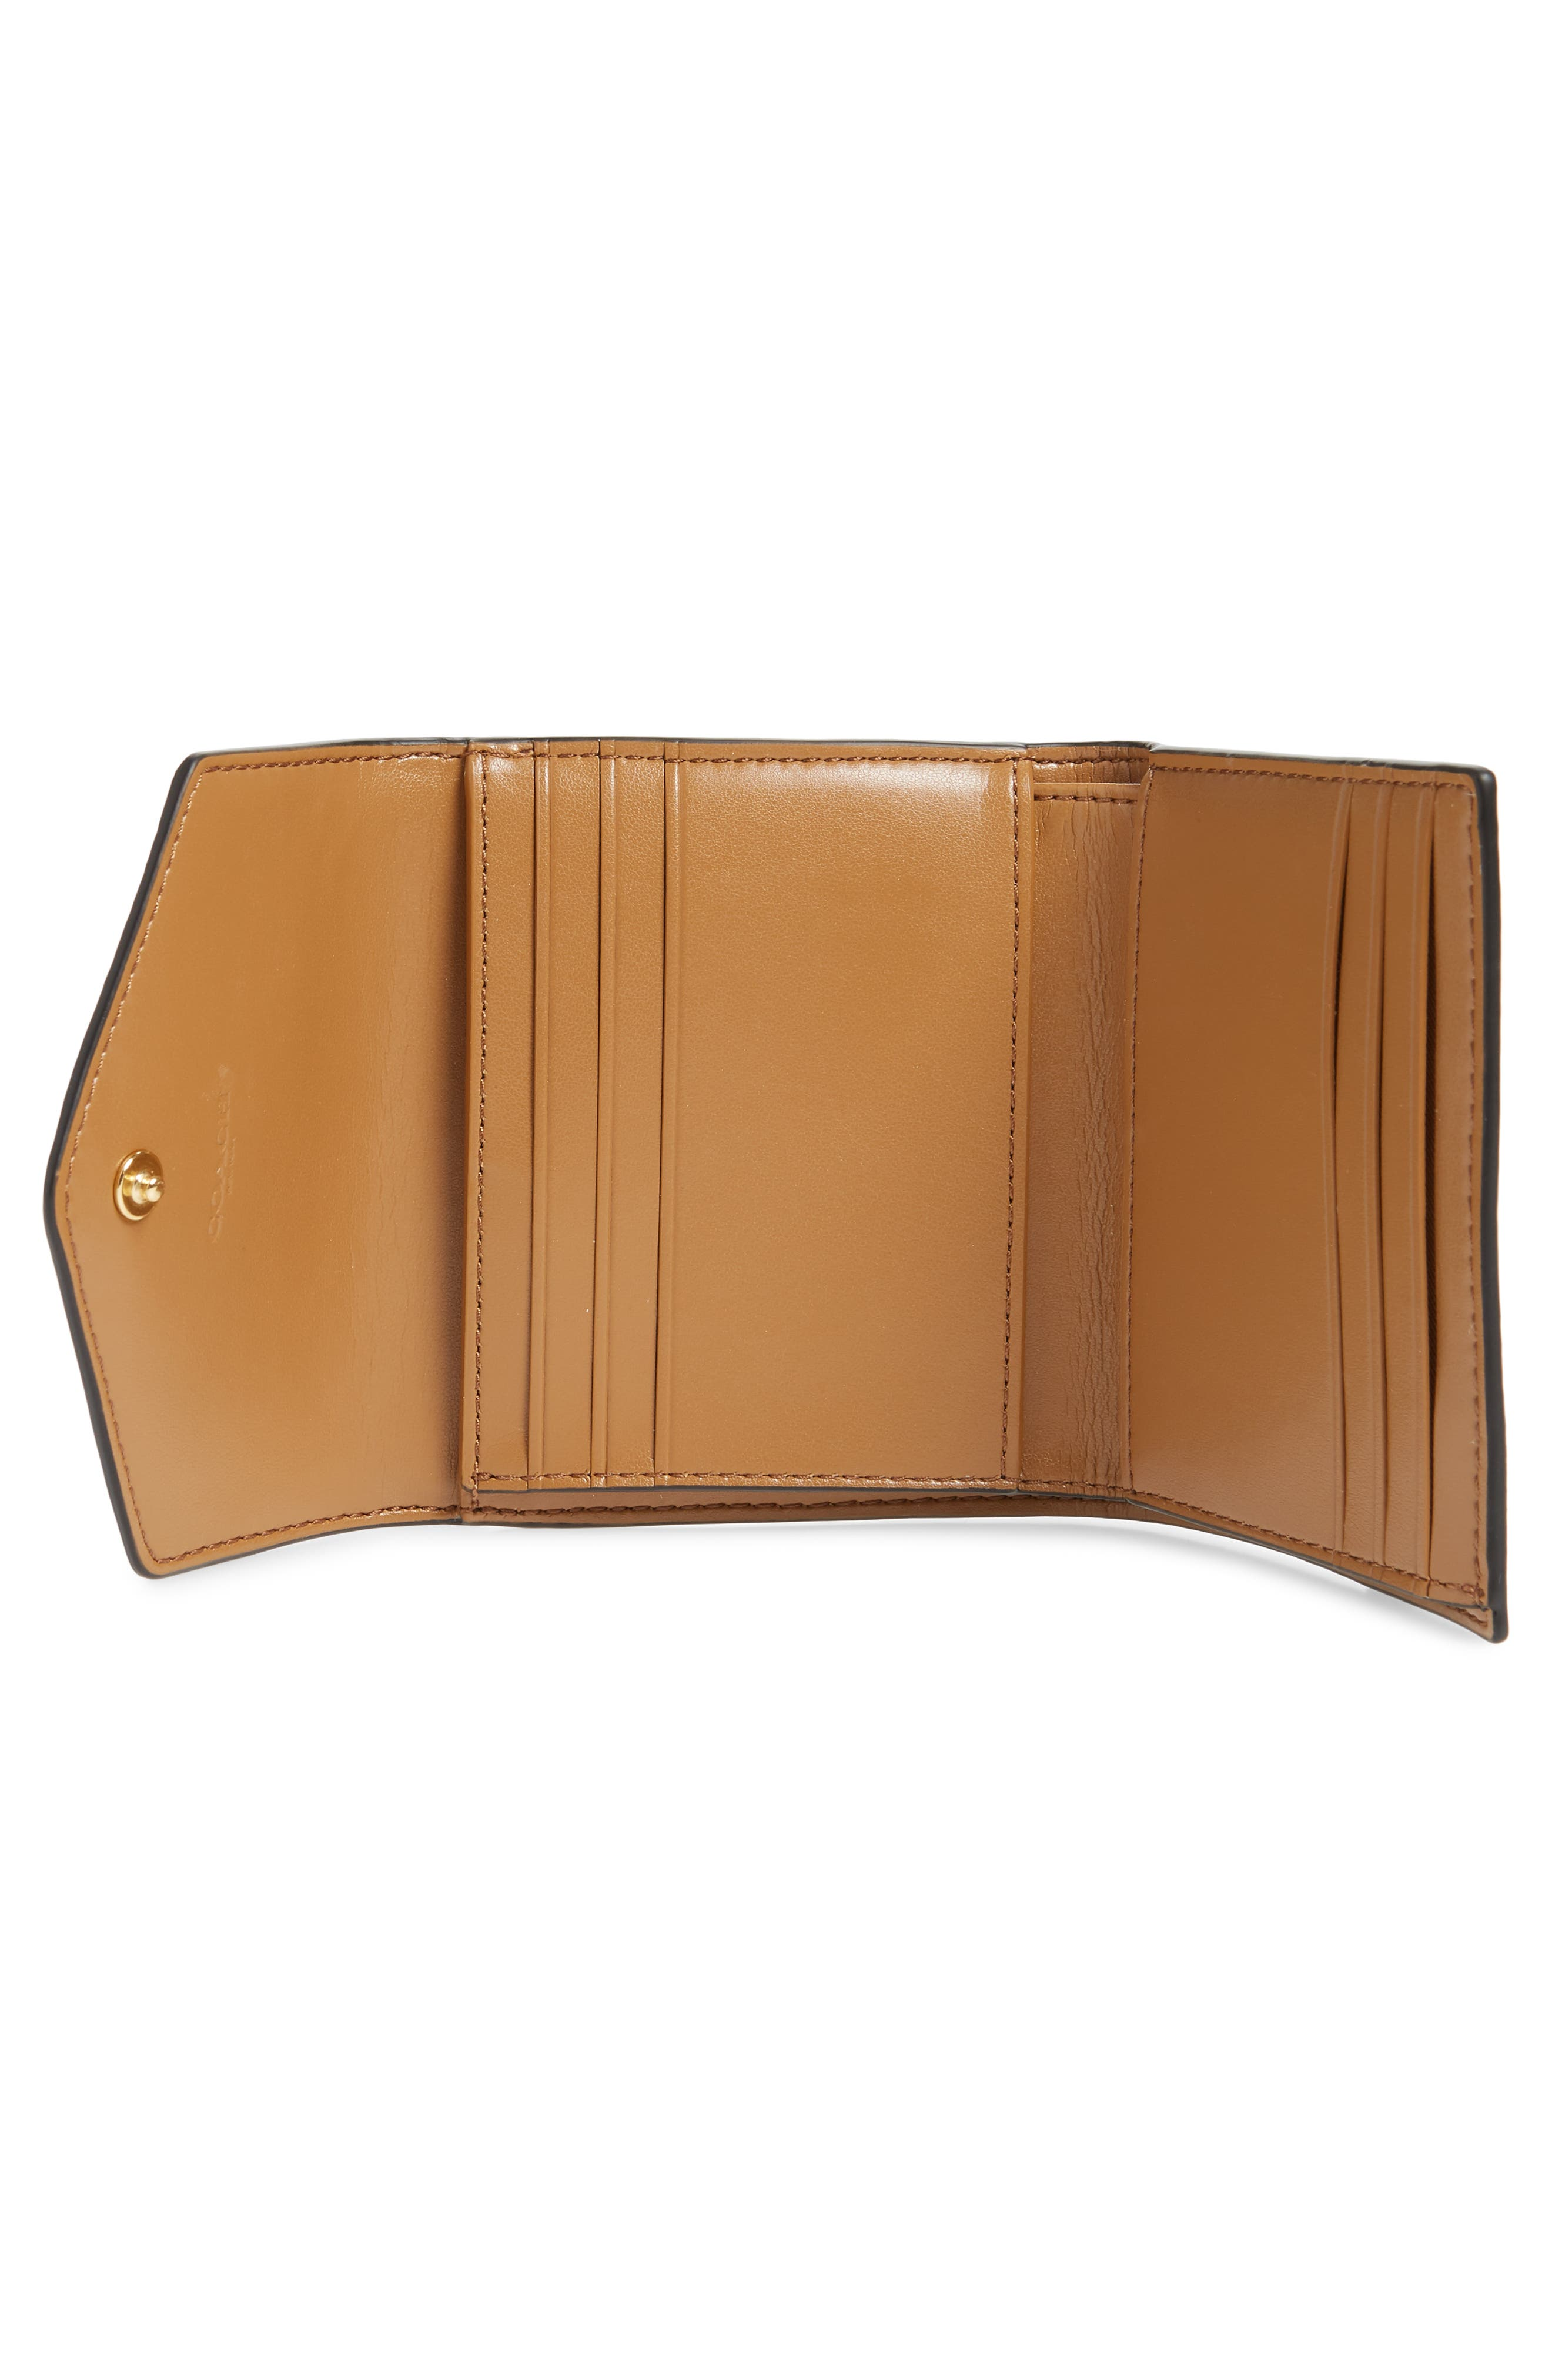 COACH, Leather & Signature Canvas Trifold Wallet, Alternate thumbnail 2, color, TAN BLACK